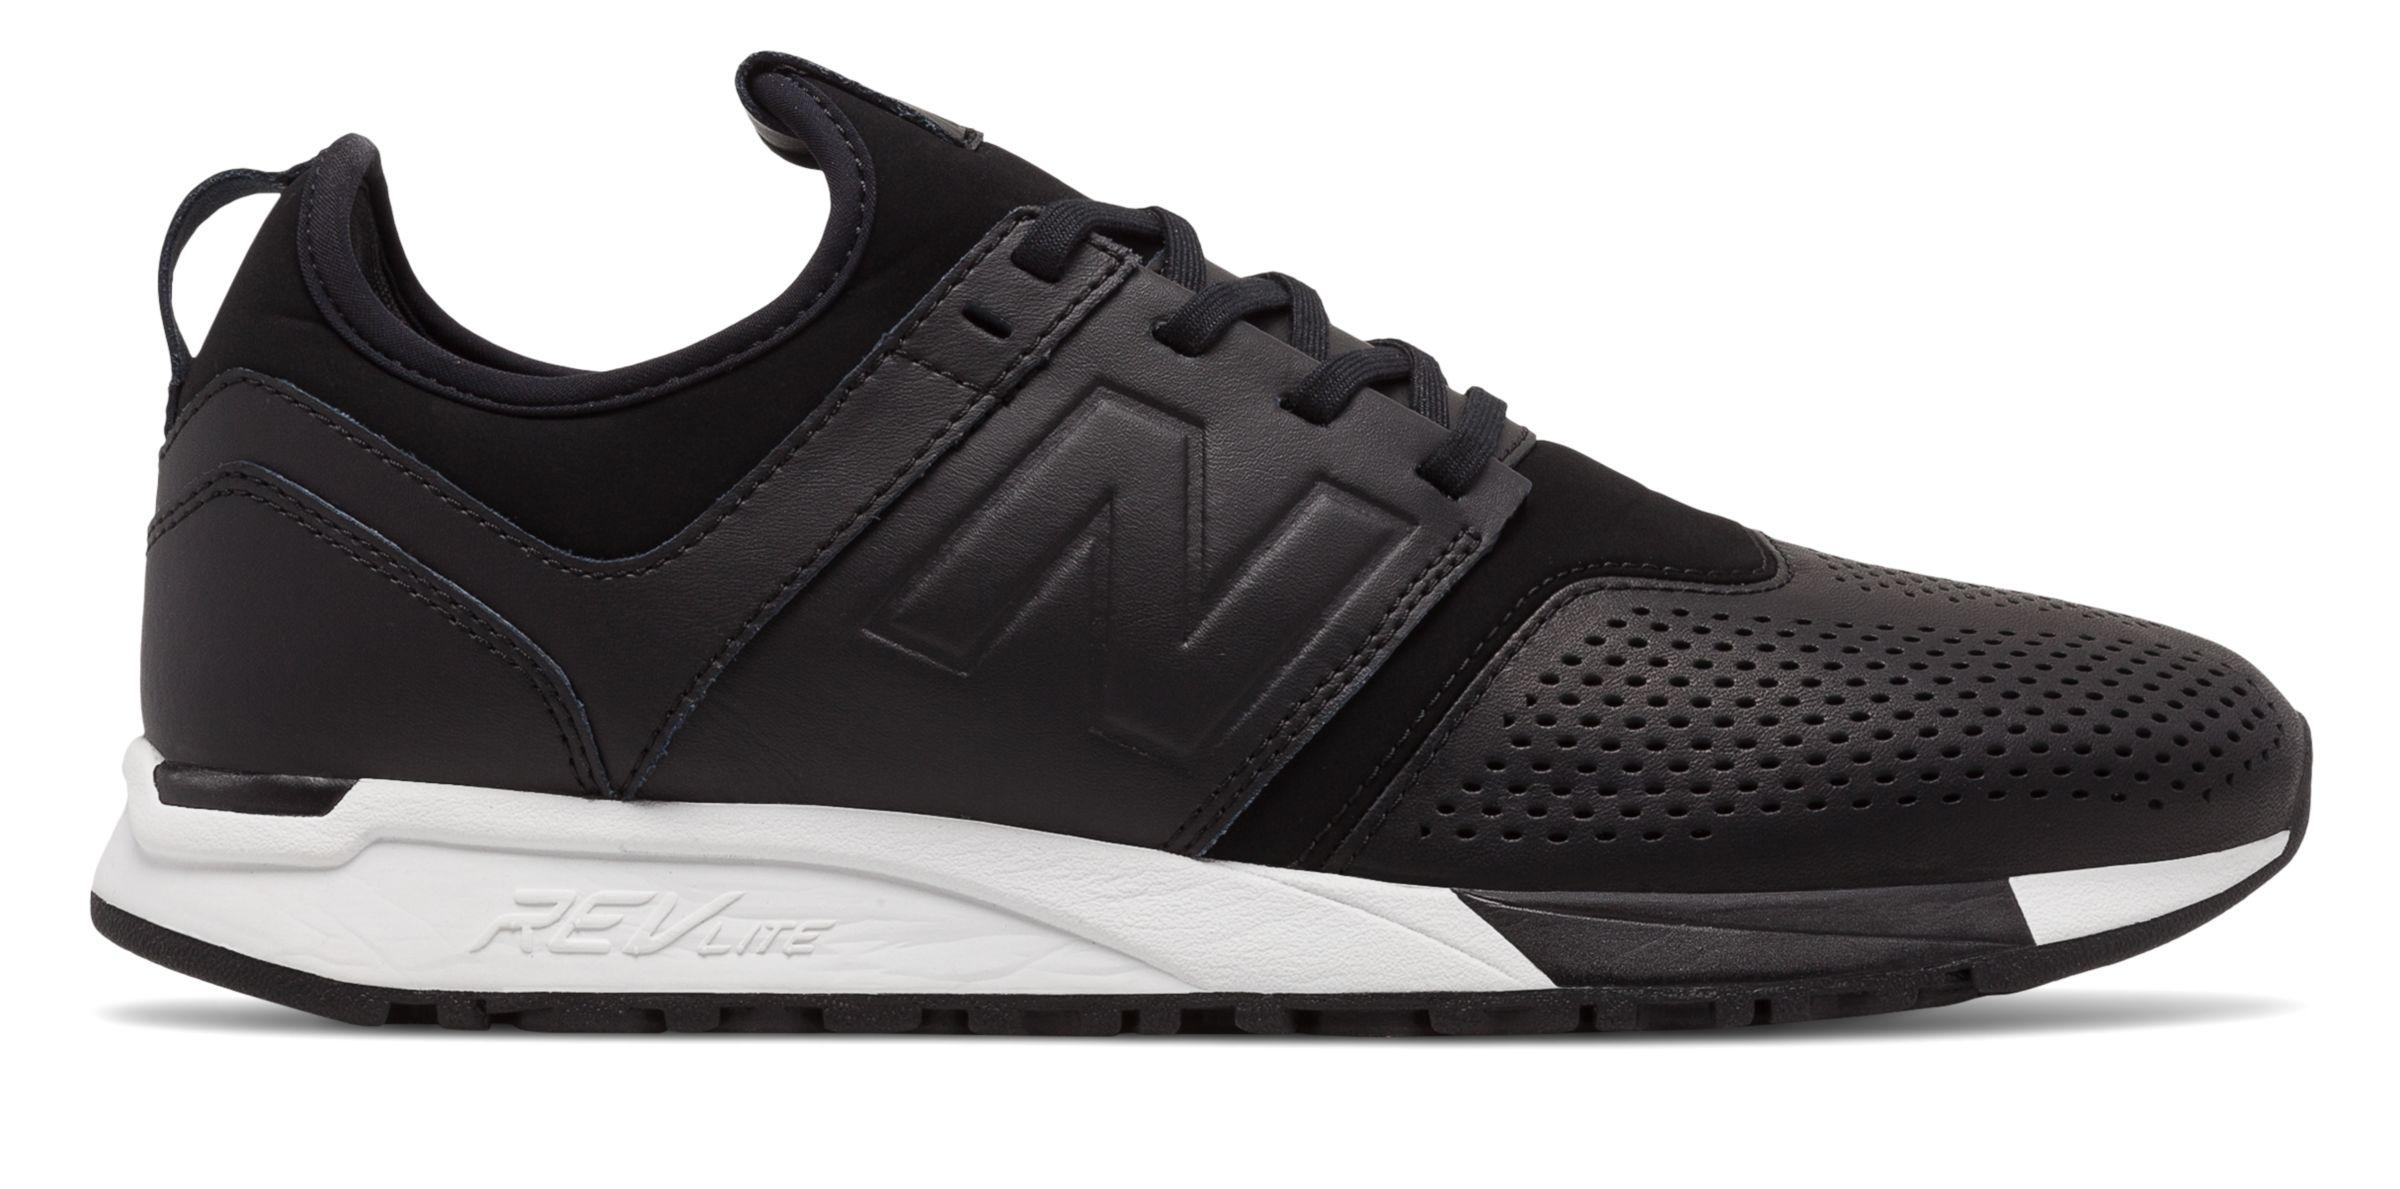 New Balance Men s 247 Leather Shoes Black with White  e208d5b49e